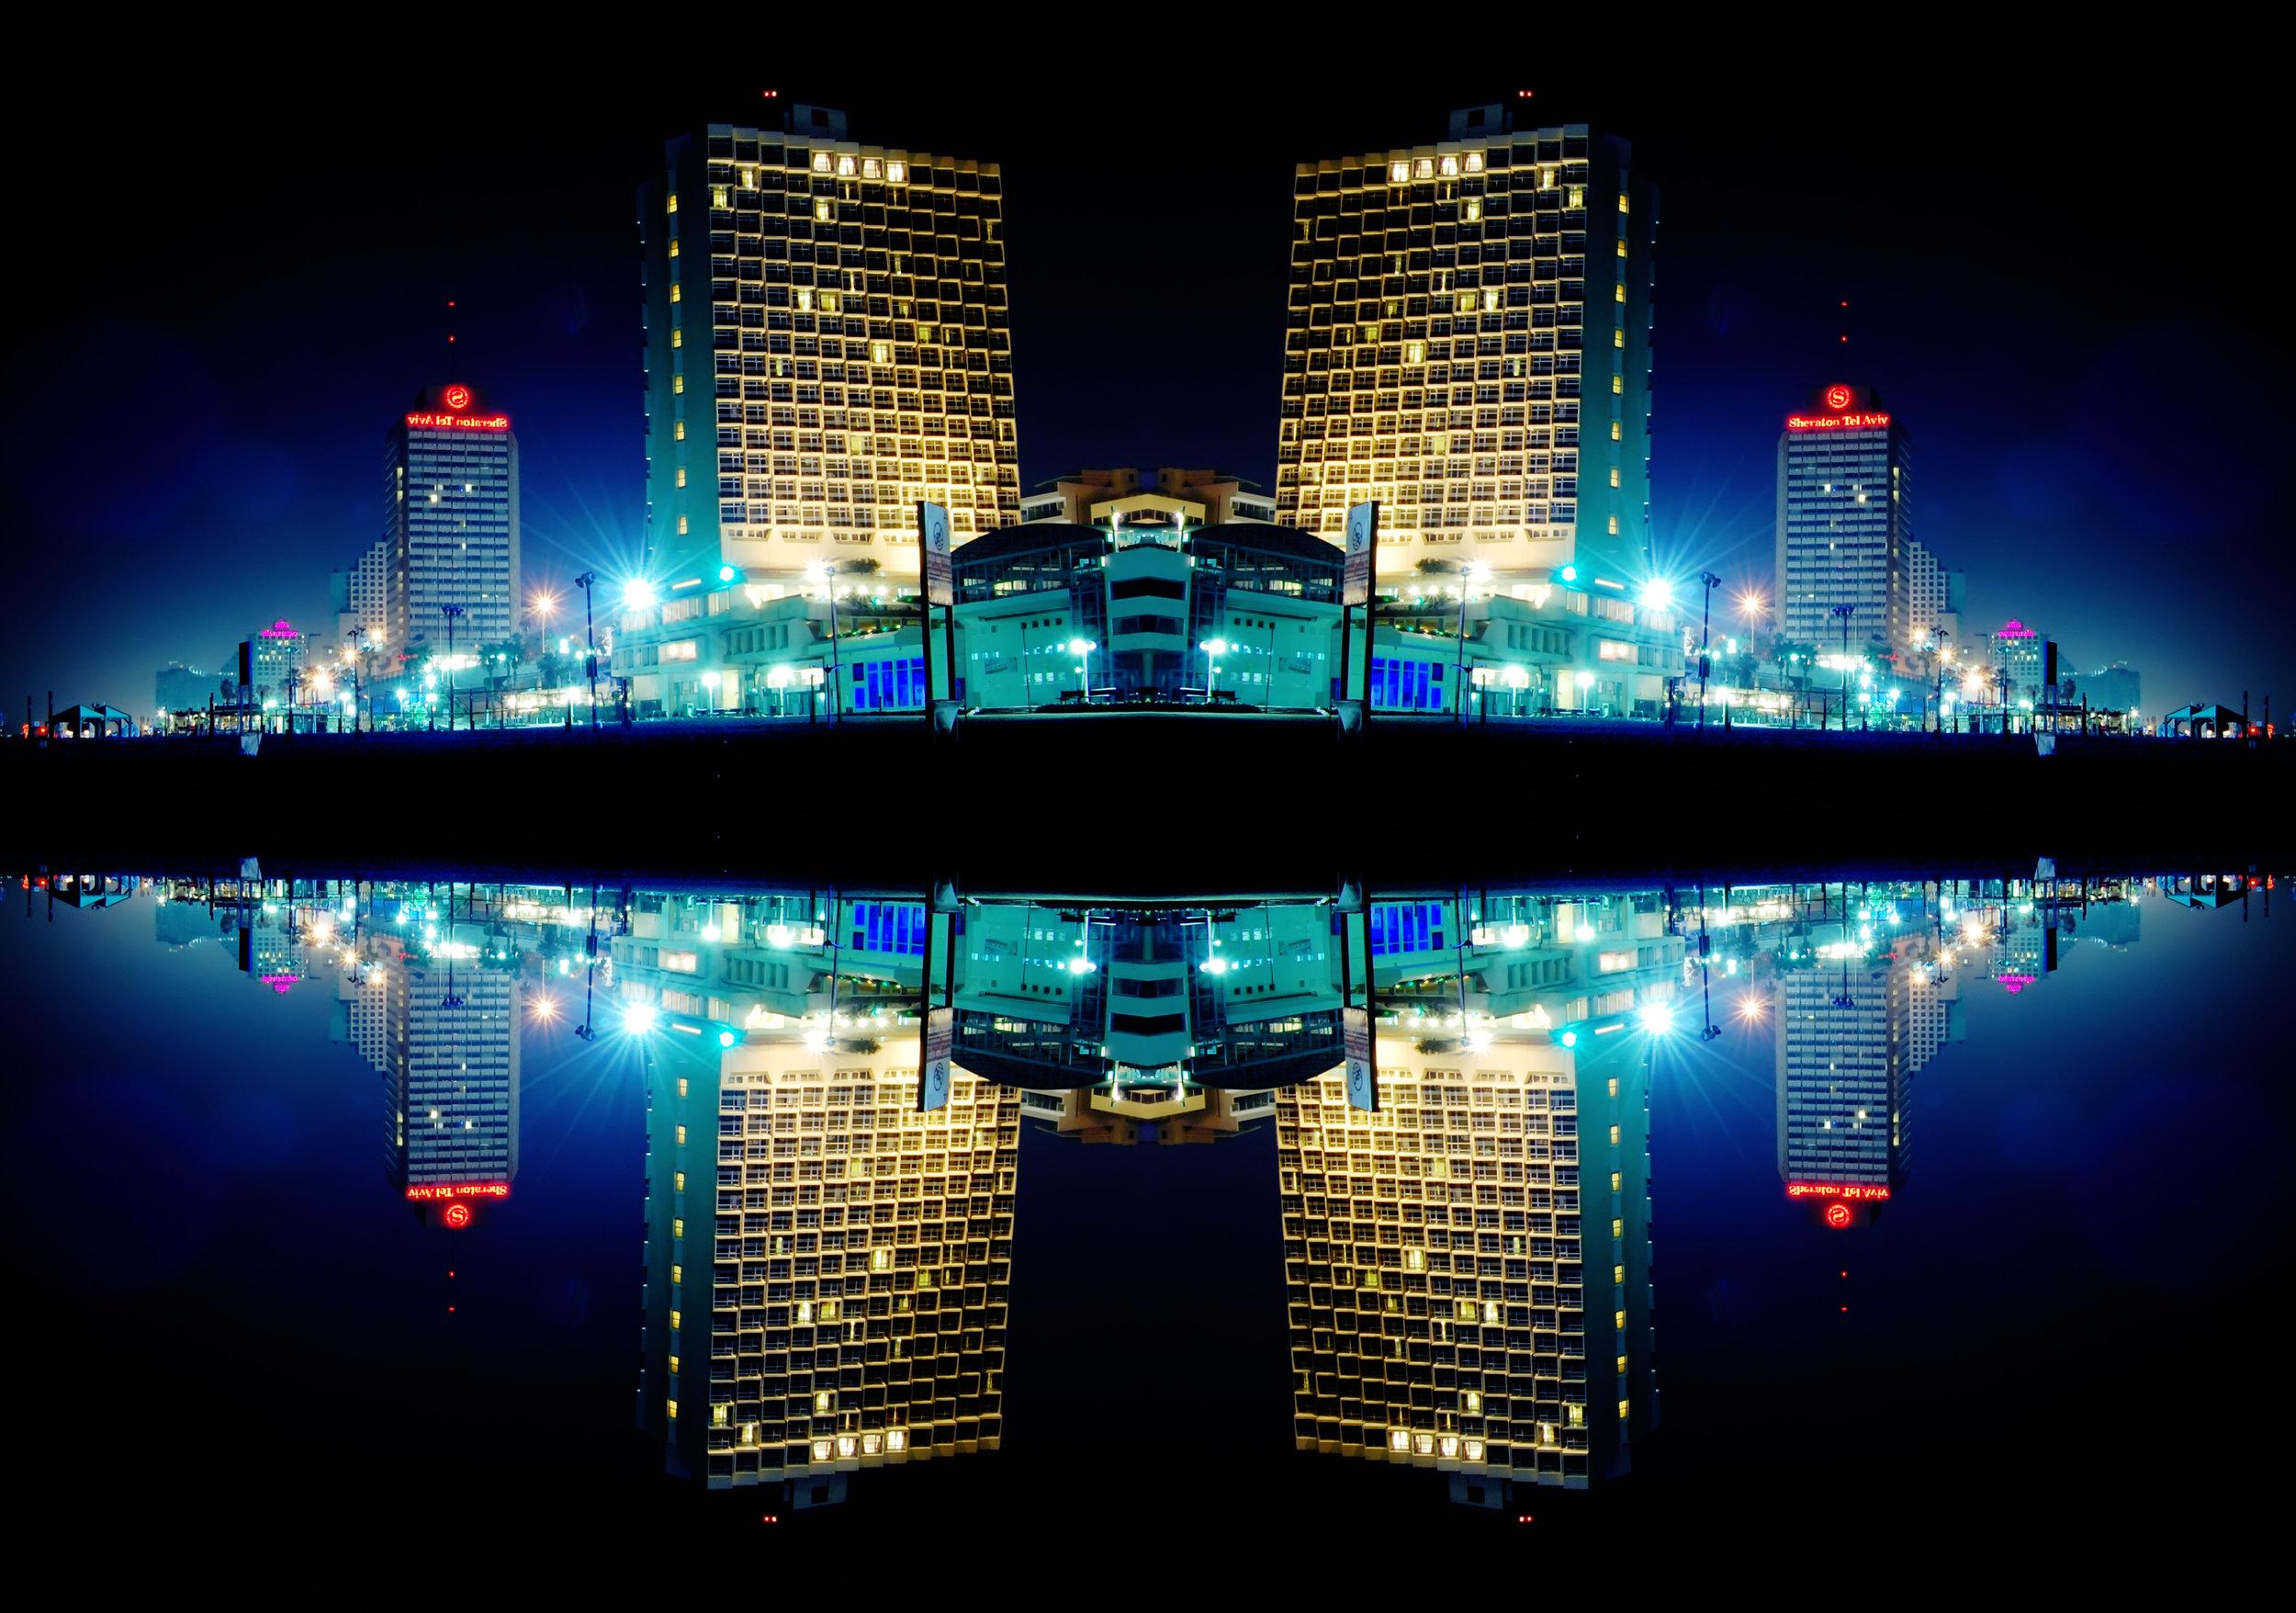 hotelAviv.jpg